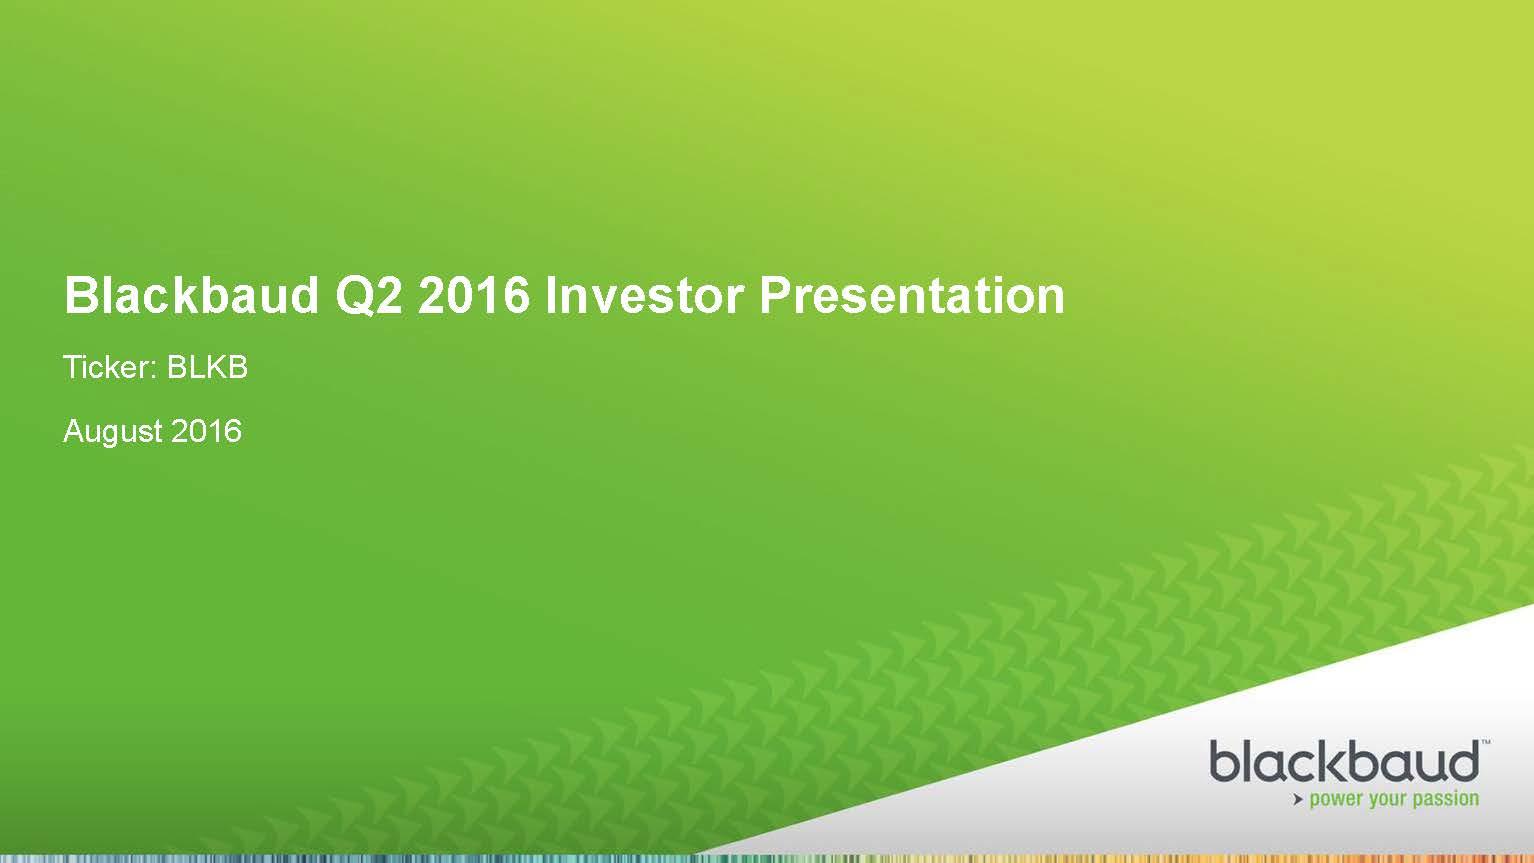 Blackbaud Investor Presentation